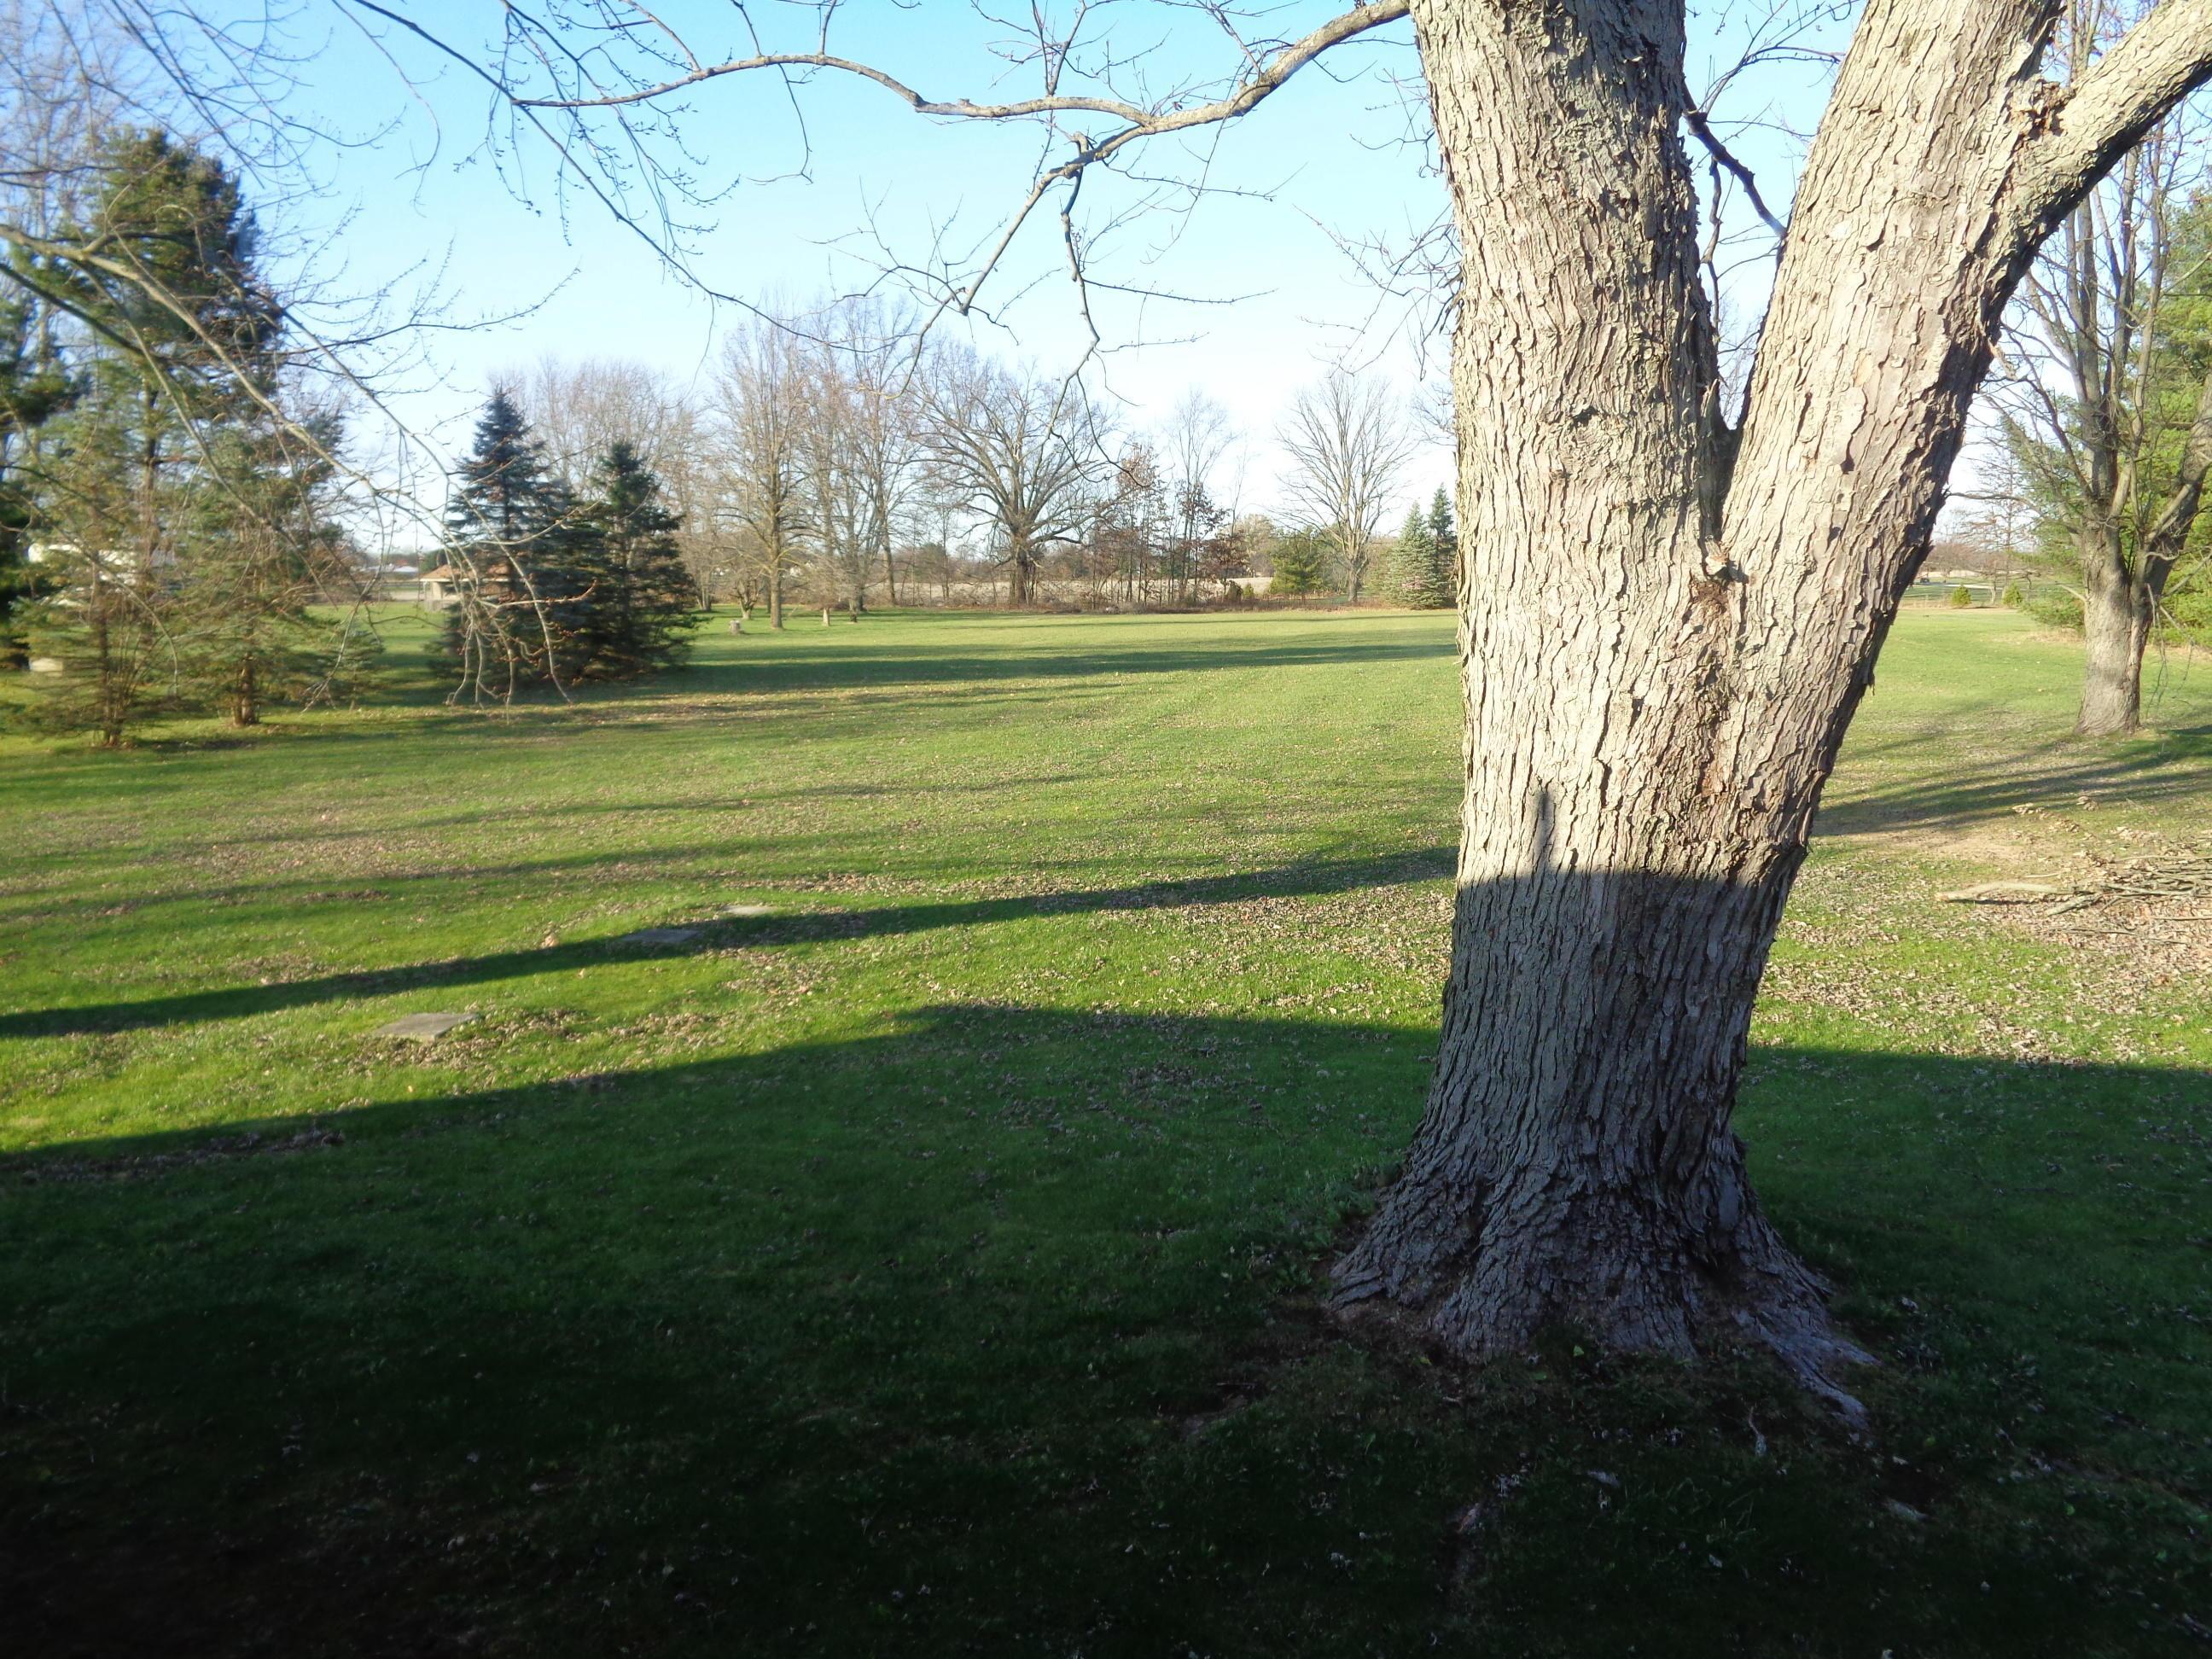 2656 Clark Shaw Road, Powell, Ohio 43065, 3 Bedrooms Bedrooms, ,2 BathroomsBathrooms,Residential,For Sale,Clark Shaw,220040551